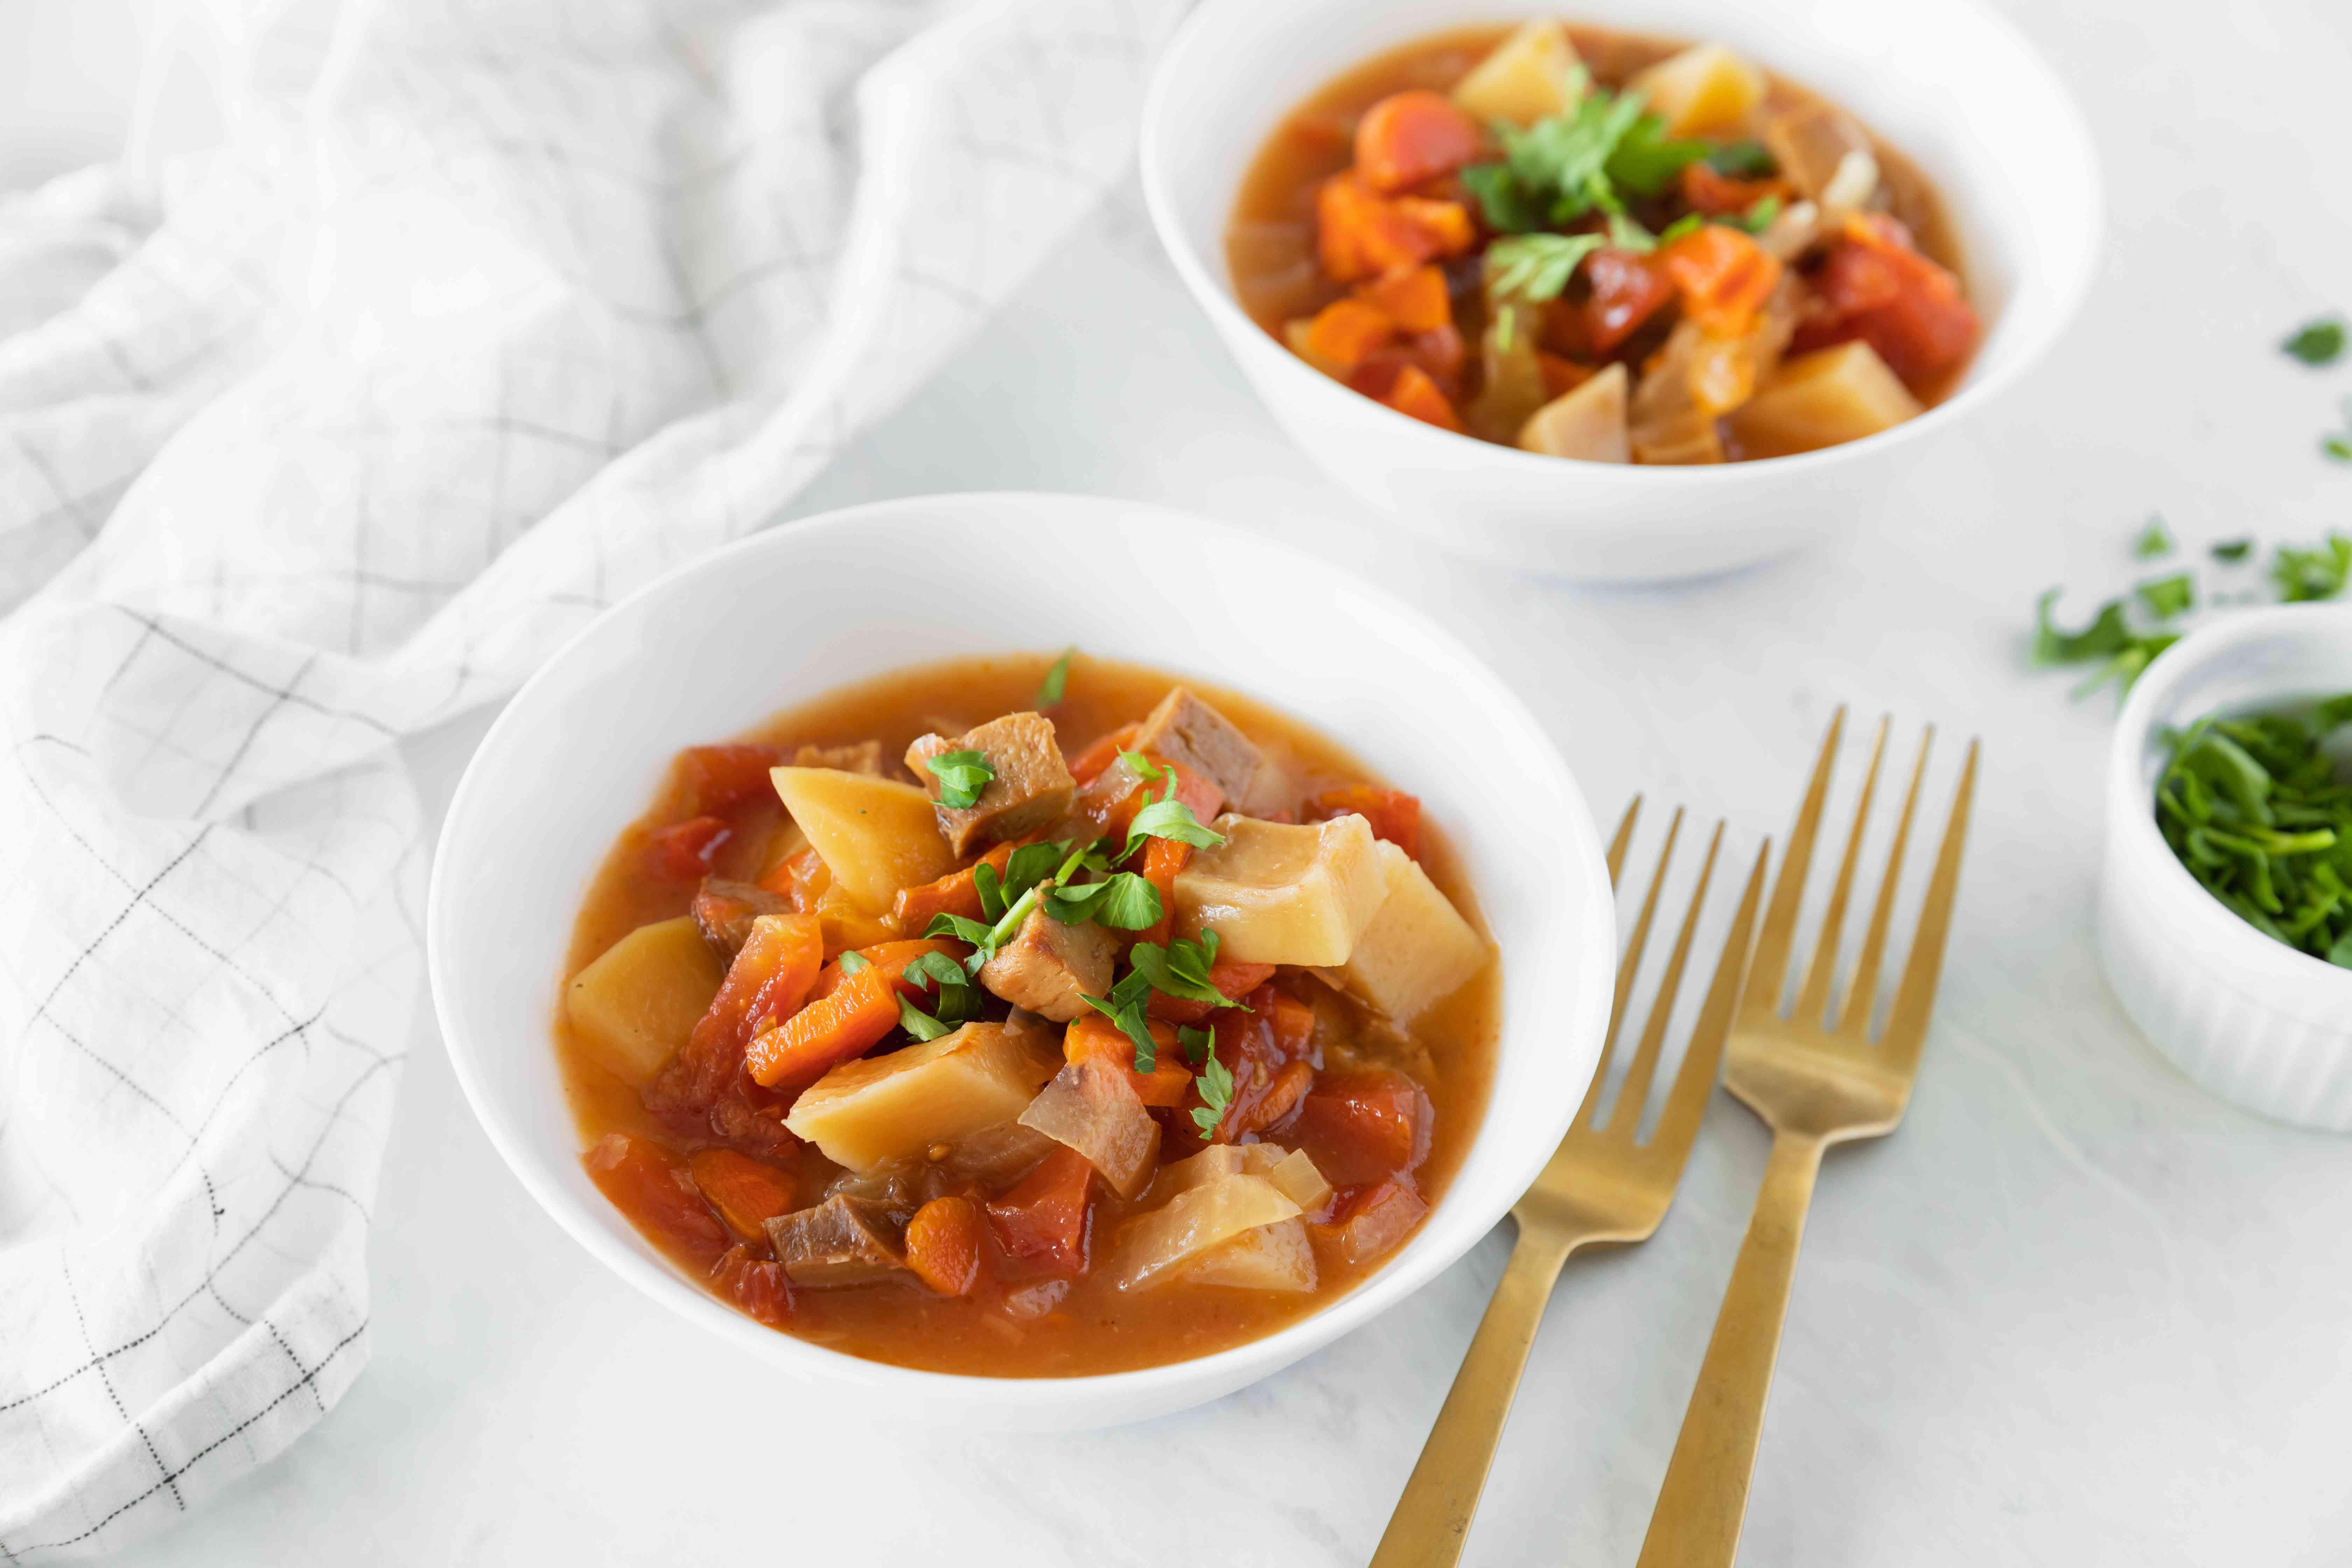 Crock pot vegetarian stew in white bowls